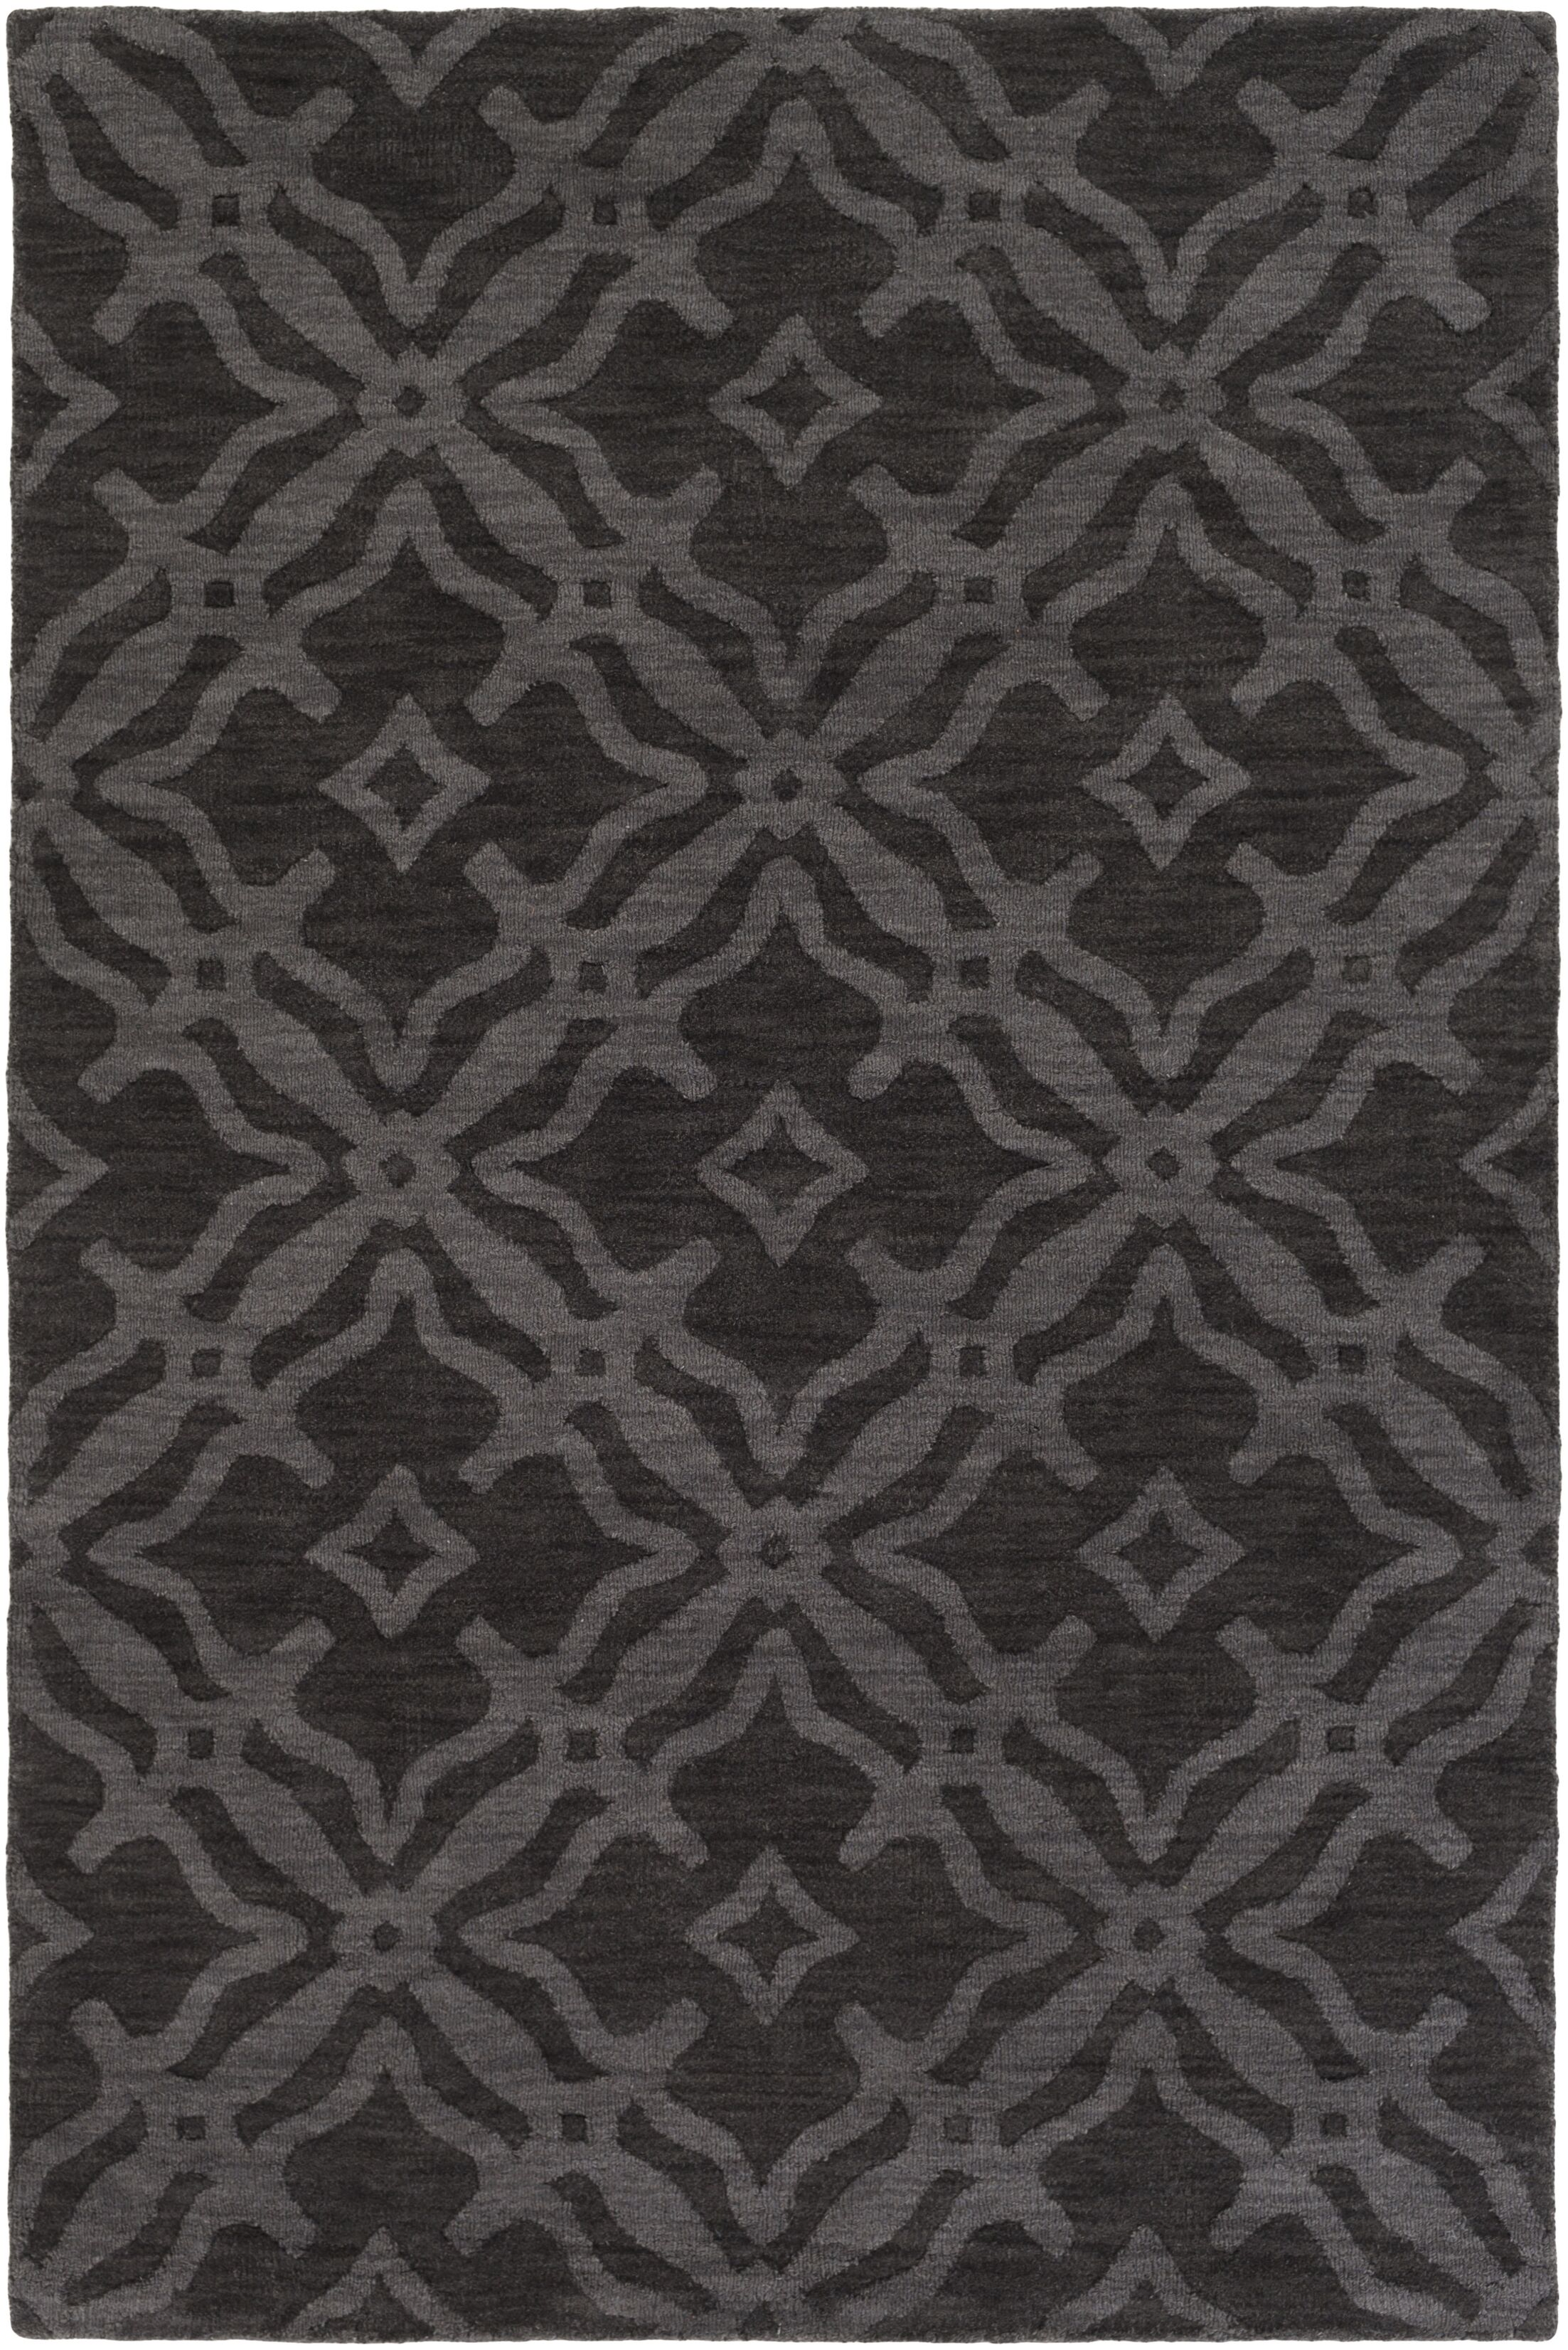 Dutchess Handmade Slate Area Rug Rug Size: Rectangle 10' x 14'